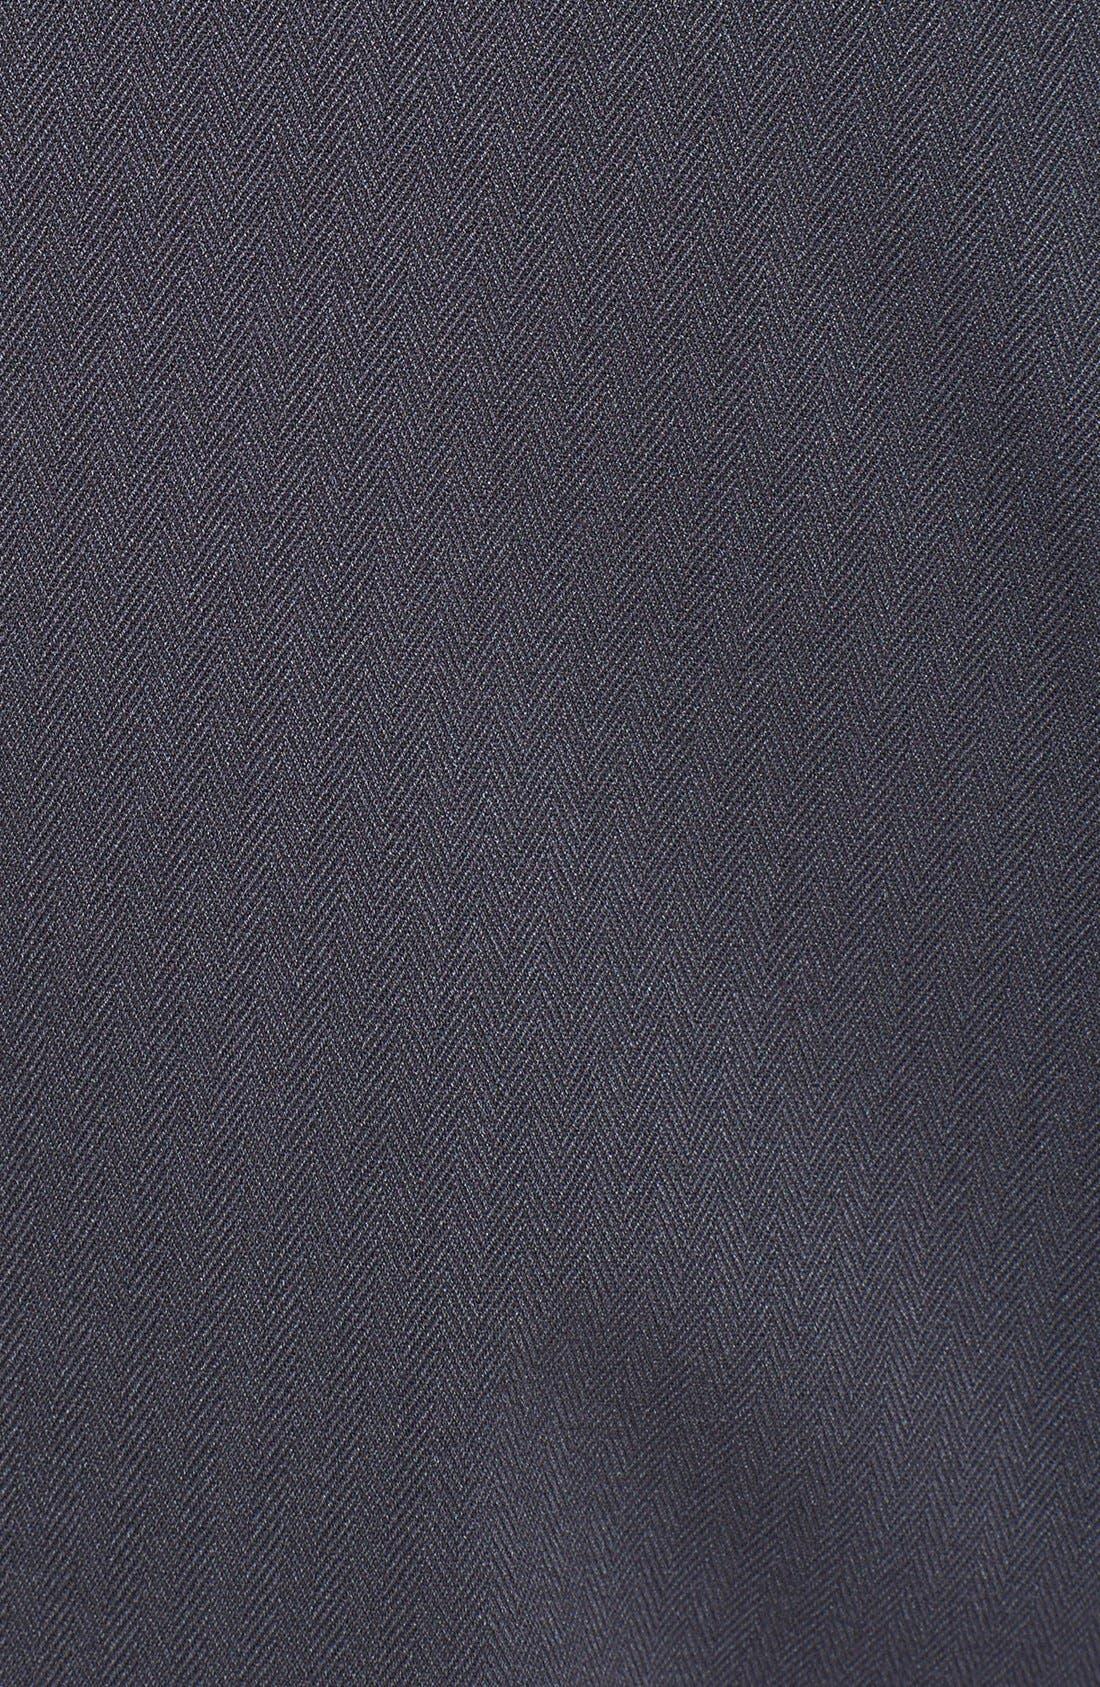 Alternate Image 3  - Michael Kors 'Laz' Waterproof Double Breasted Topcoat